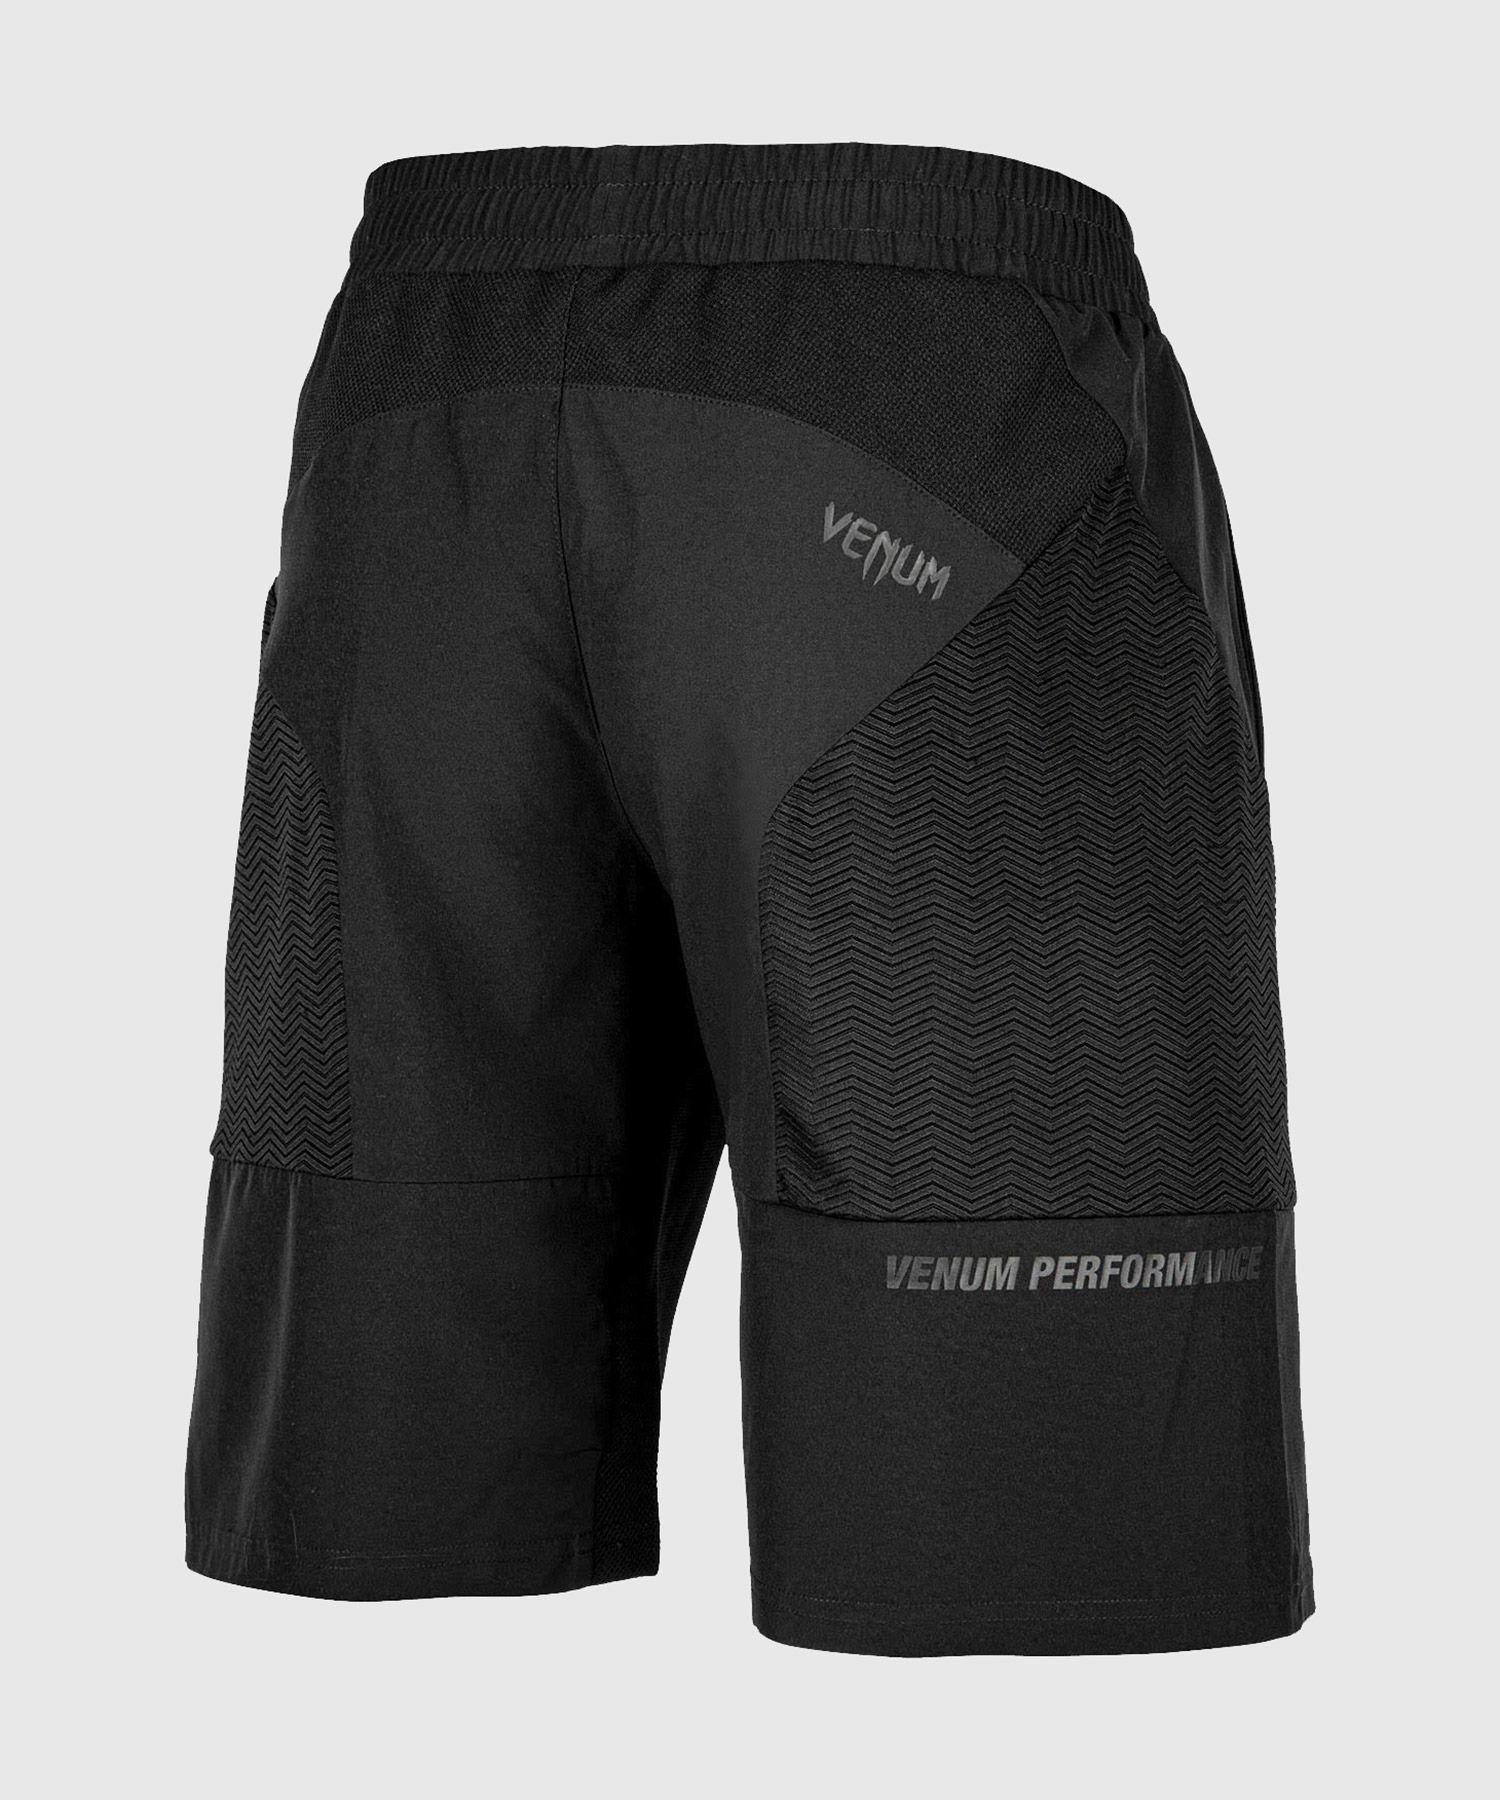 Шорты Venum G-fit Training Shorts-XS